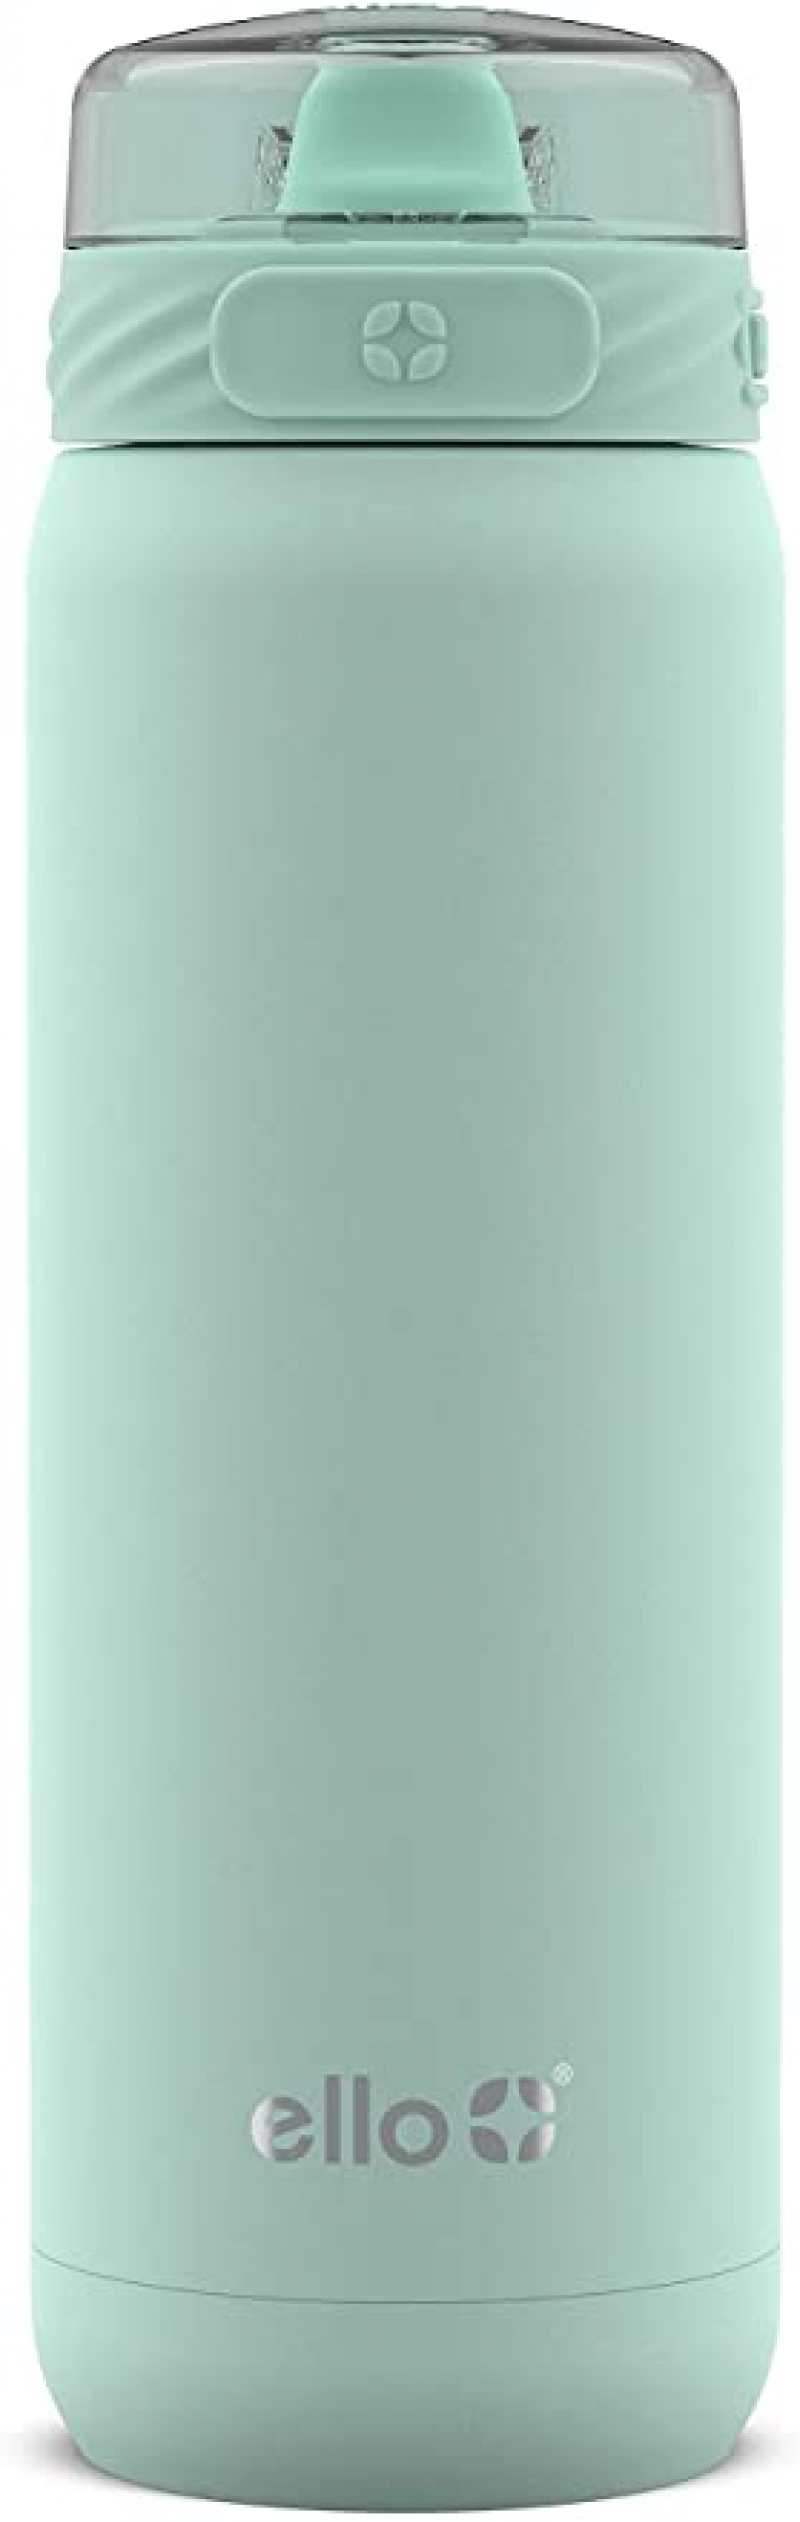 ihocon: Ello Cooper Vacuum Insulated Stainless Steel Water Bottle 不銹鋼保冷水瓶